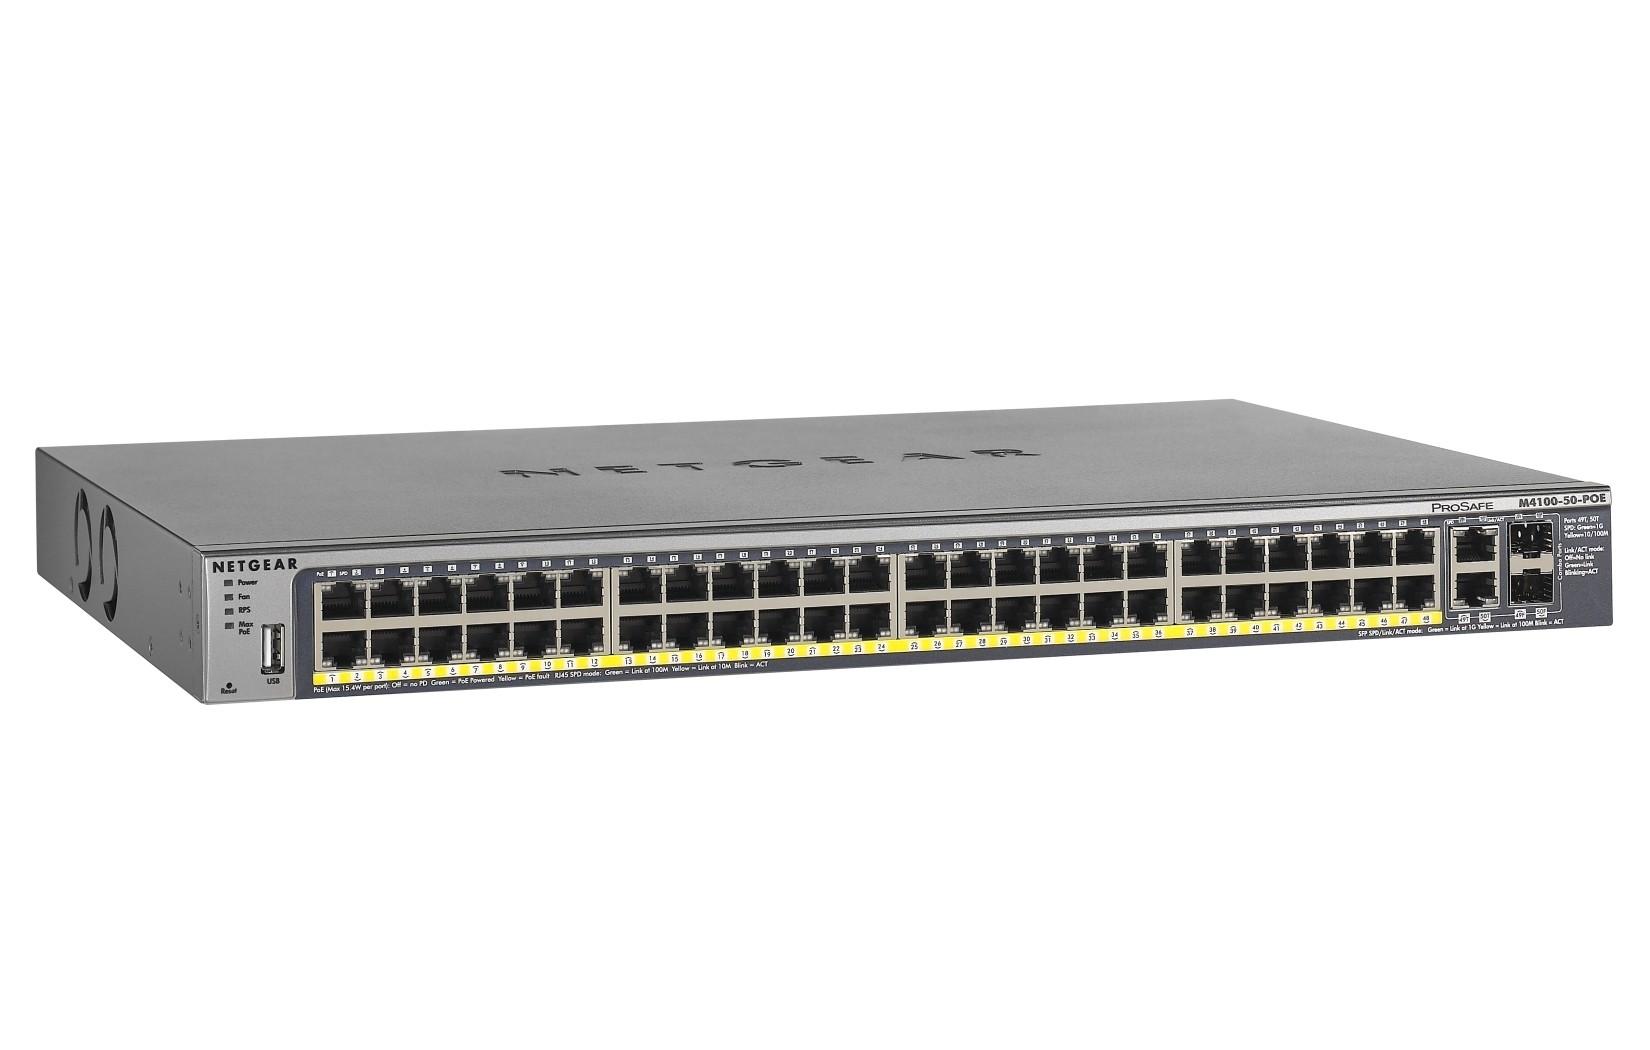 Netgear ProSafe™ M4100 50 PoE Managed Switch